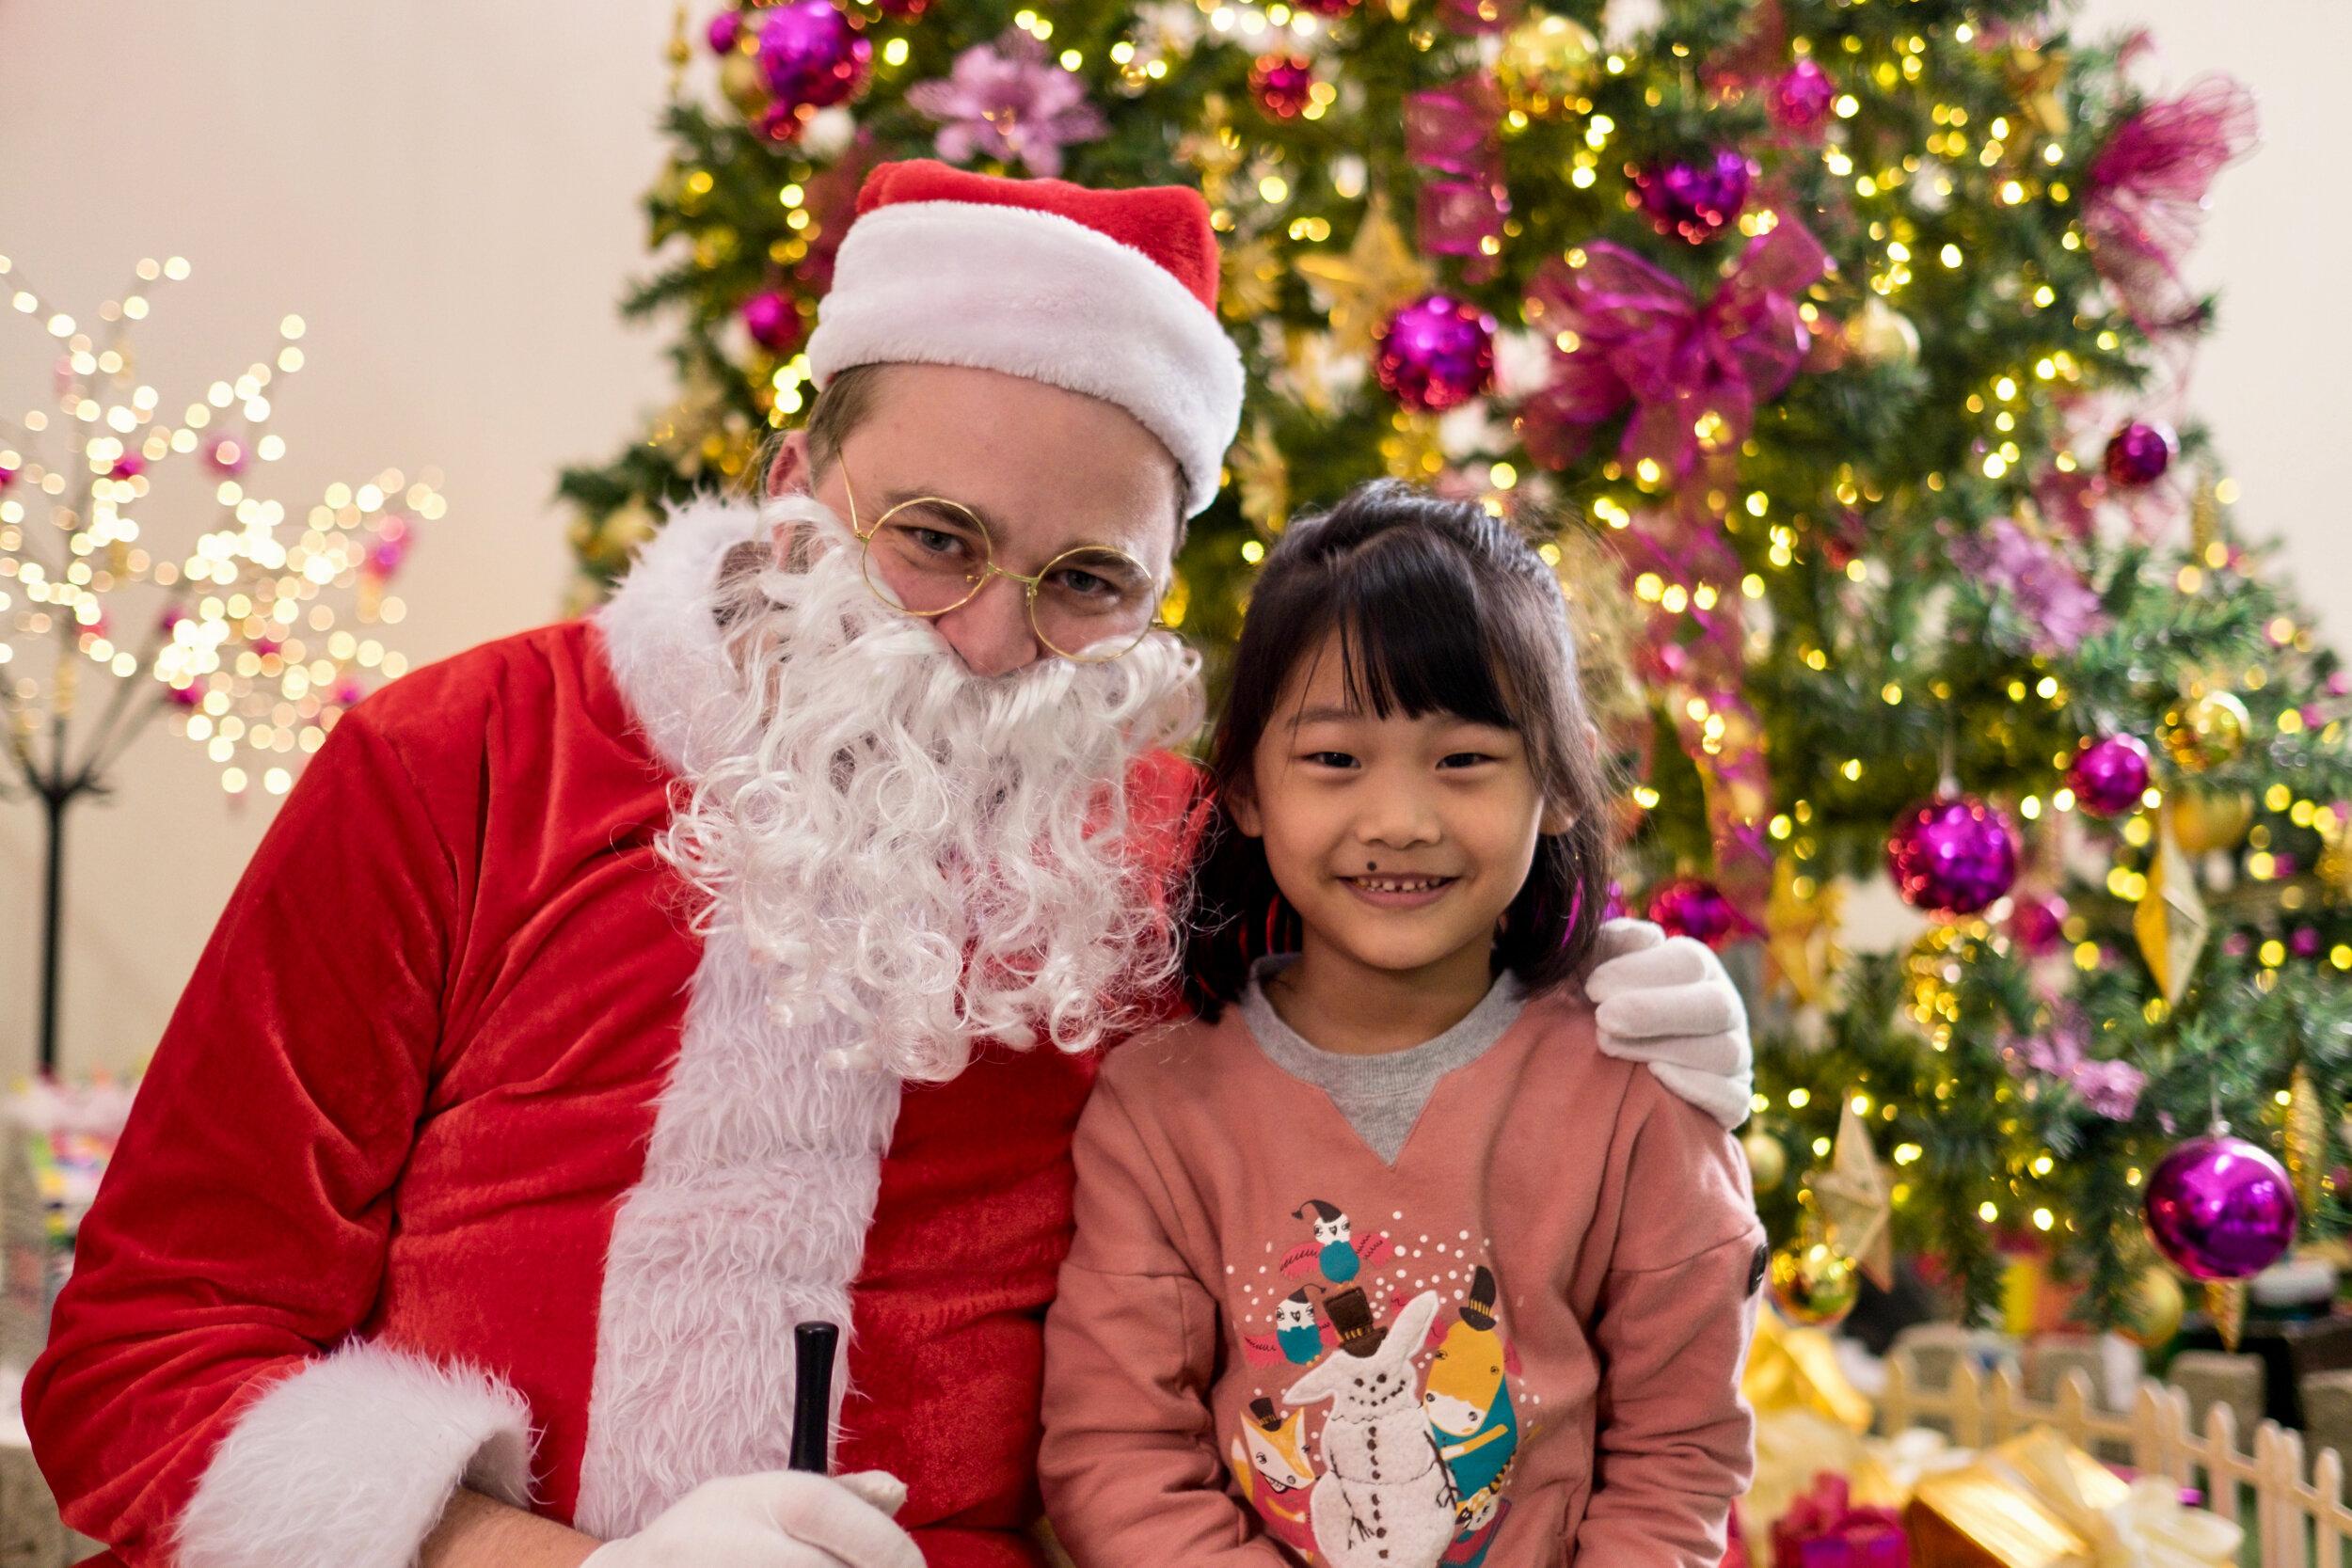 Photoshoot with Santa Clause-943.jpg